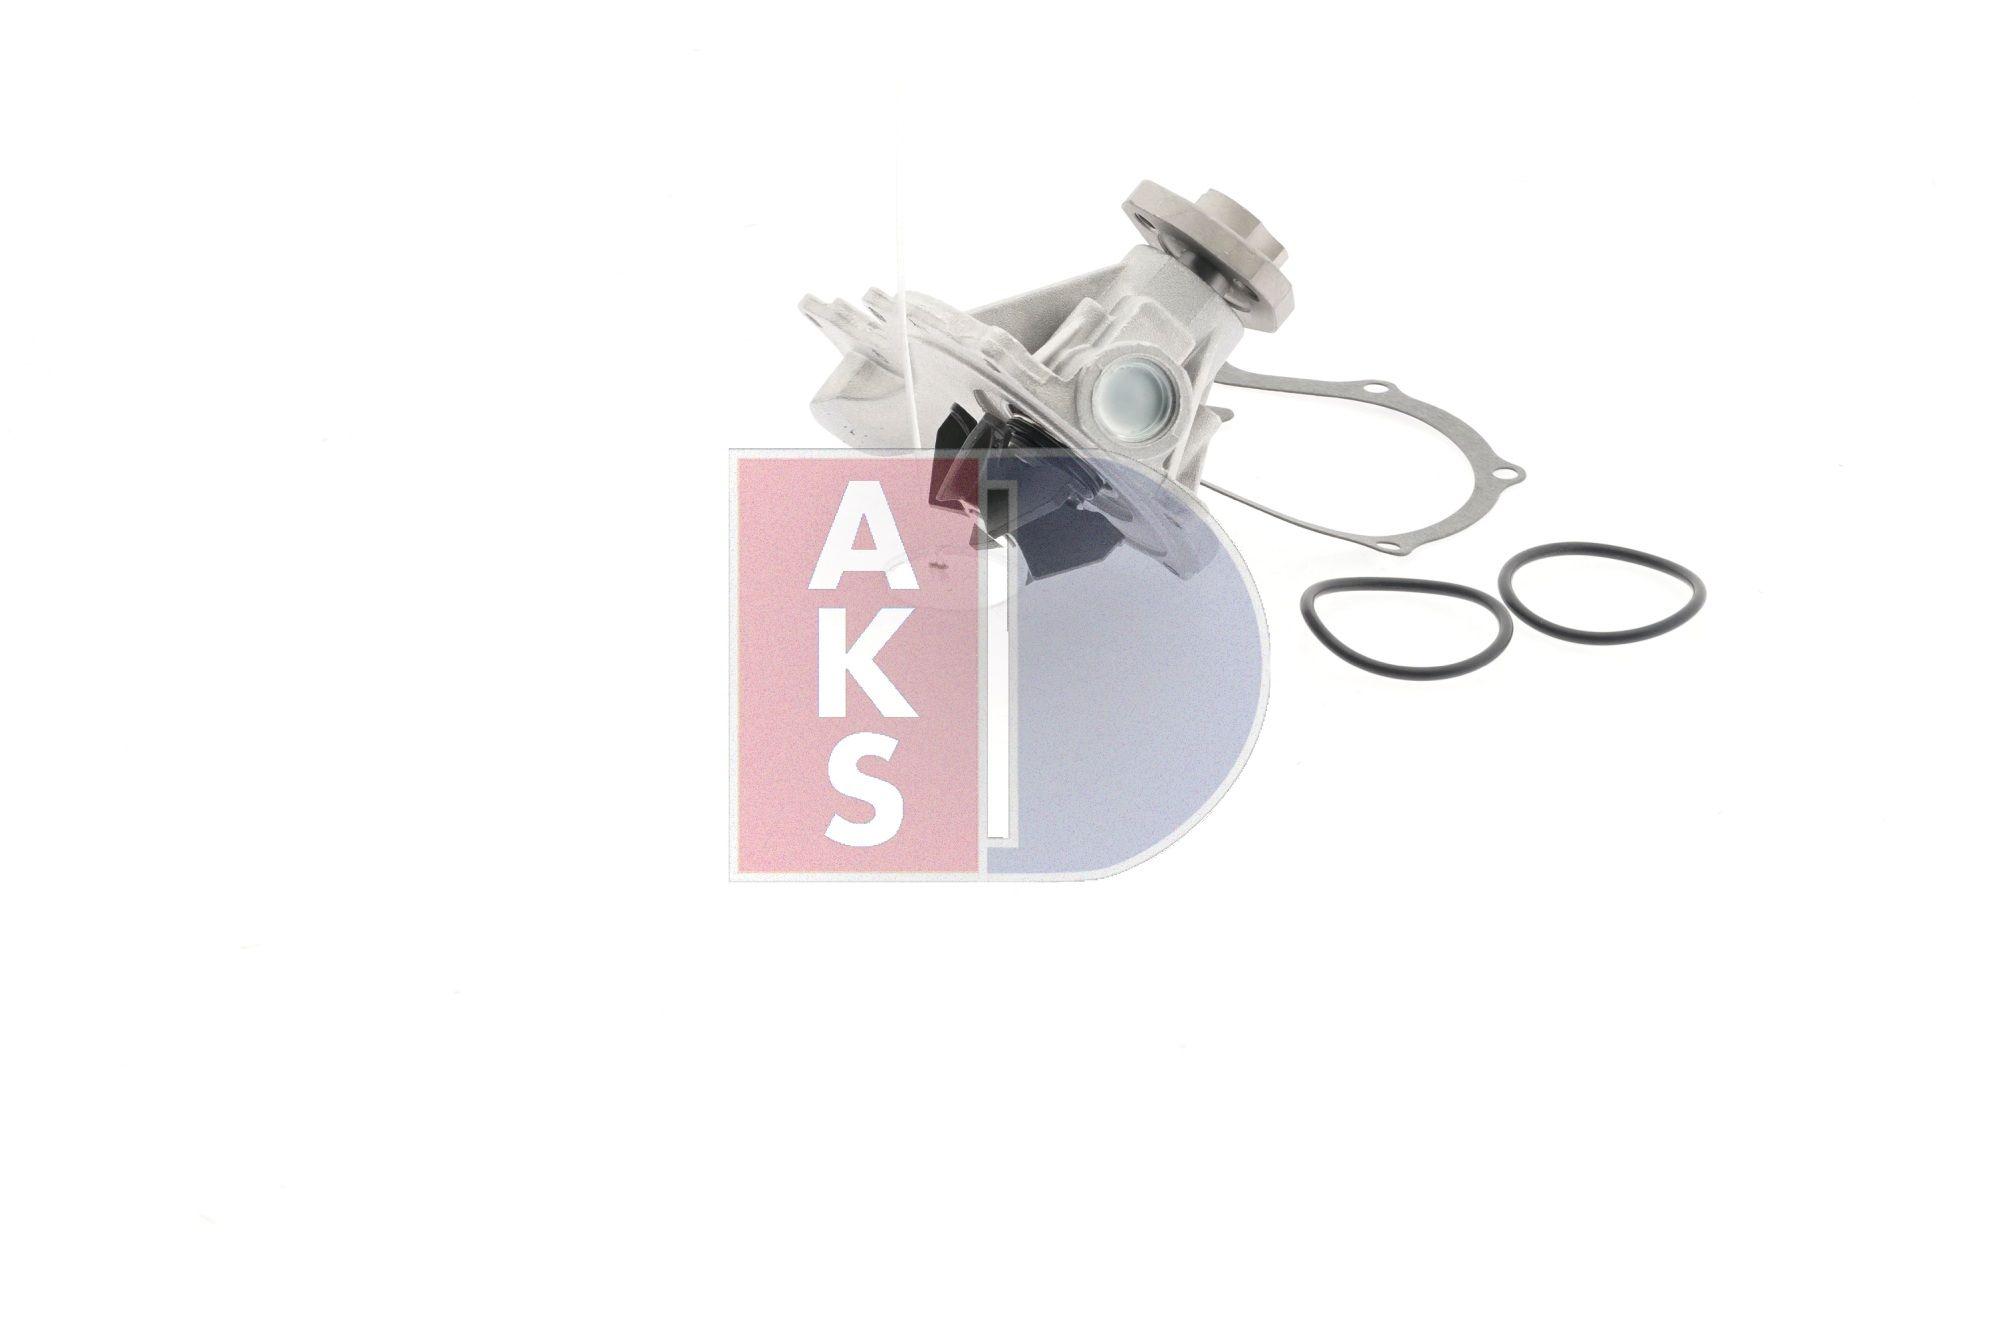 570003N Kühlmittelpumpe AKS DASIS in Original Qualität